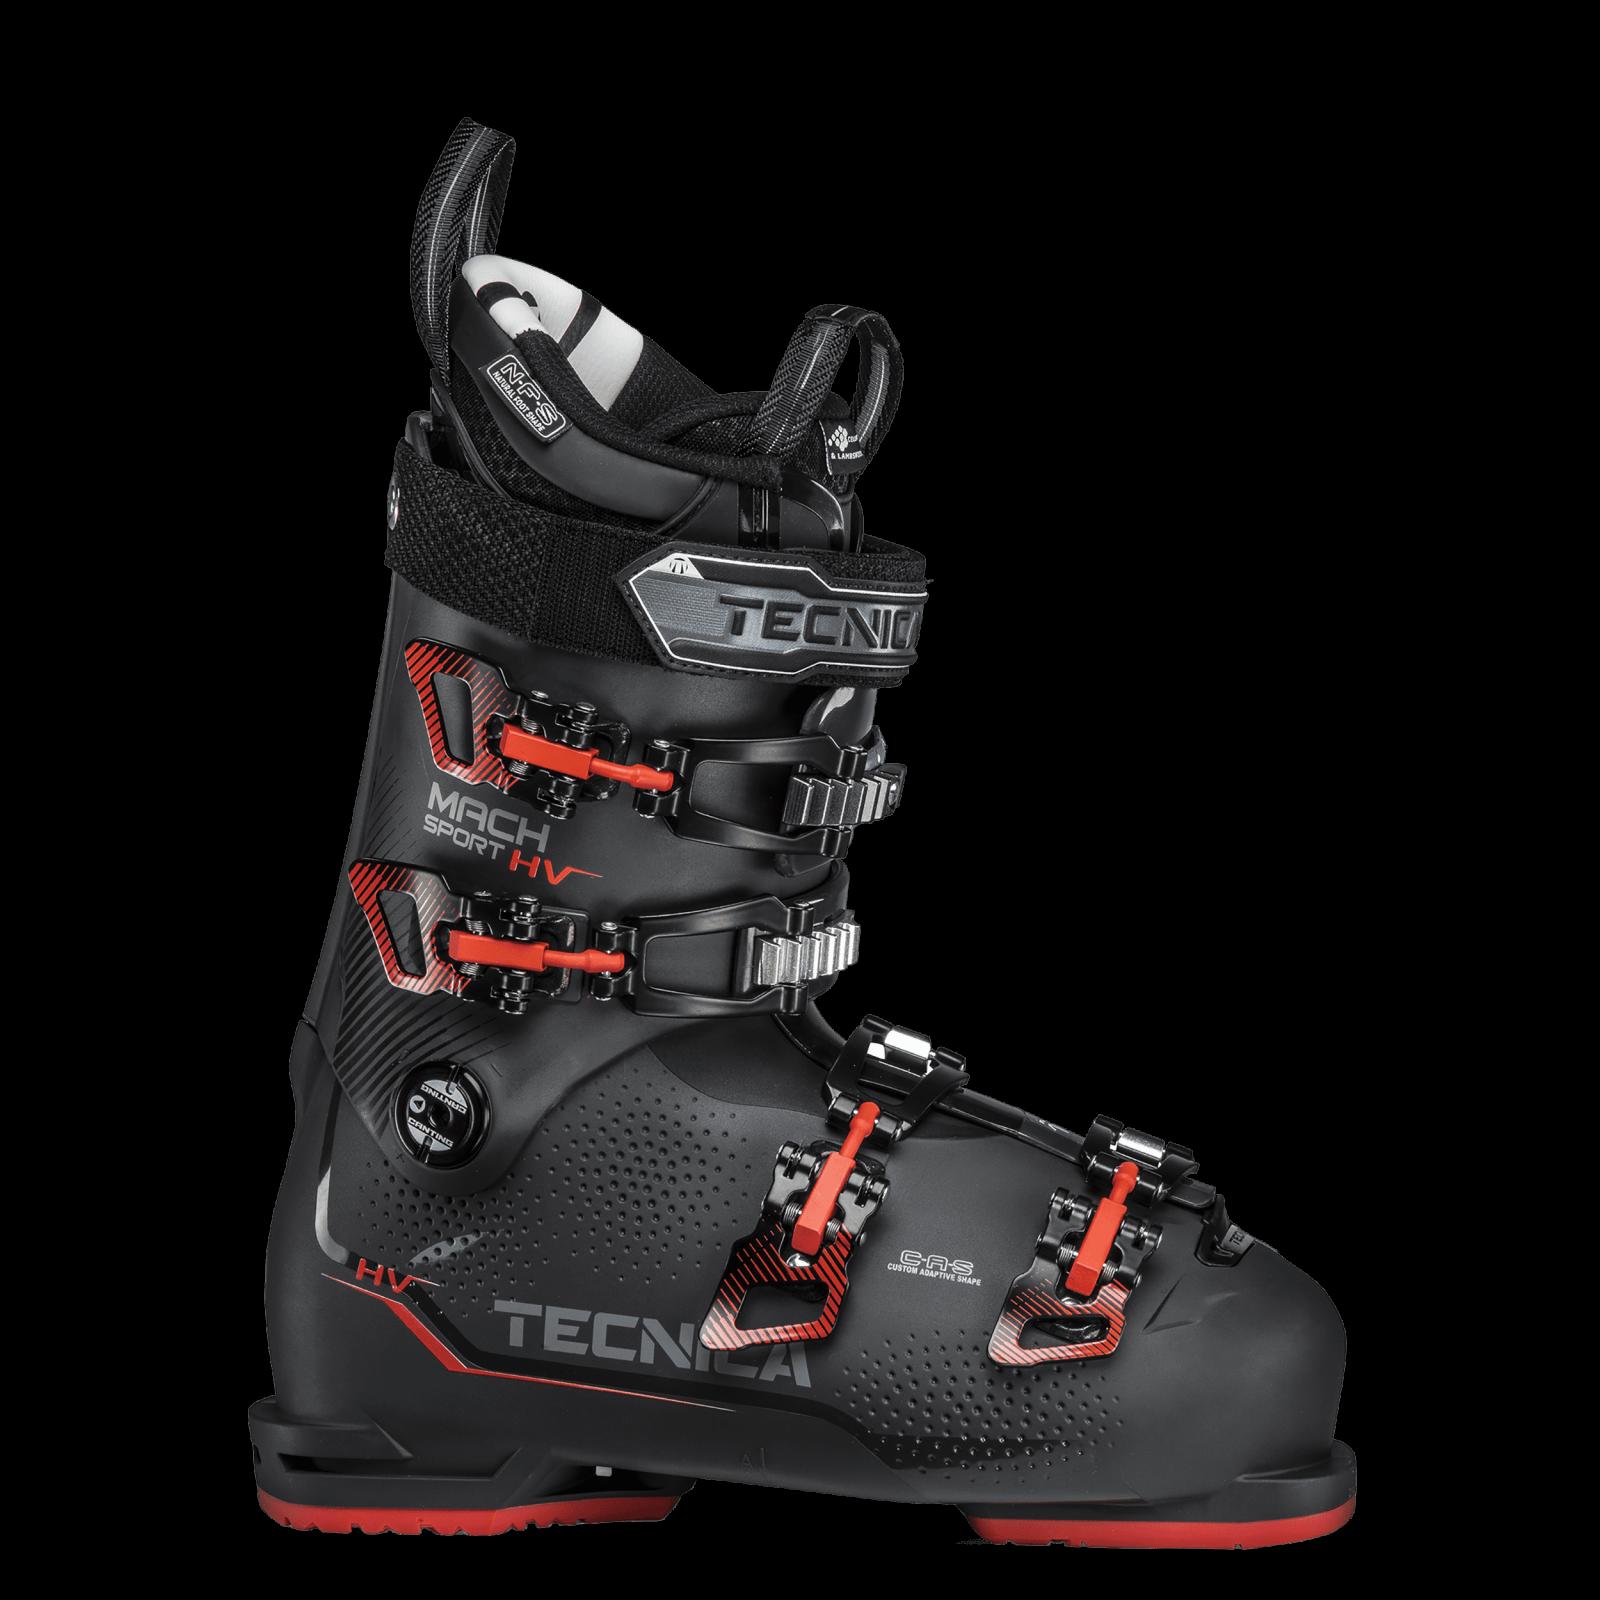 2021 Tecnica Mach Sport HV 100 Men's Ski Boots